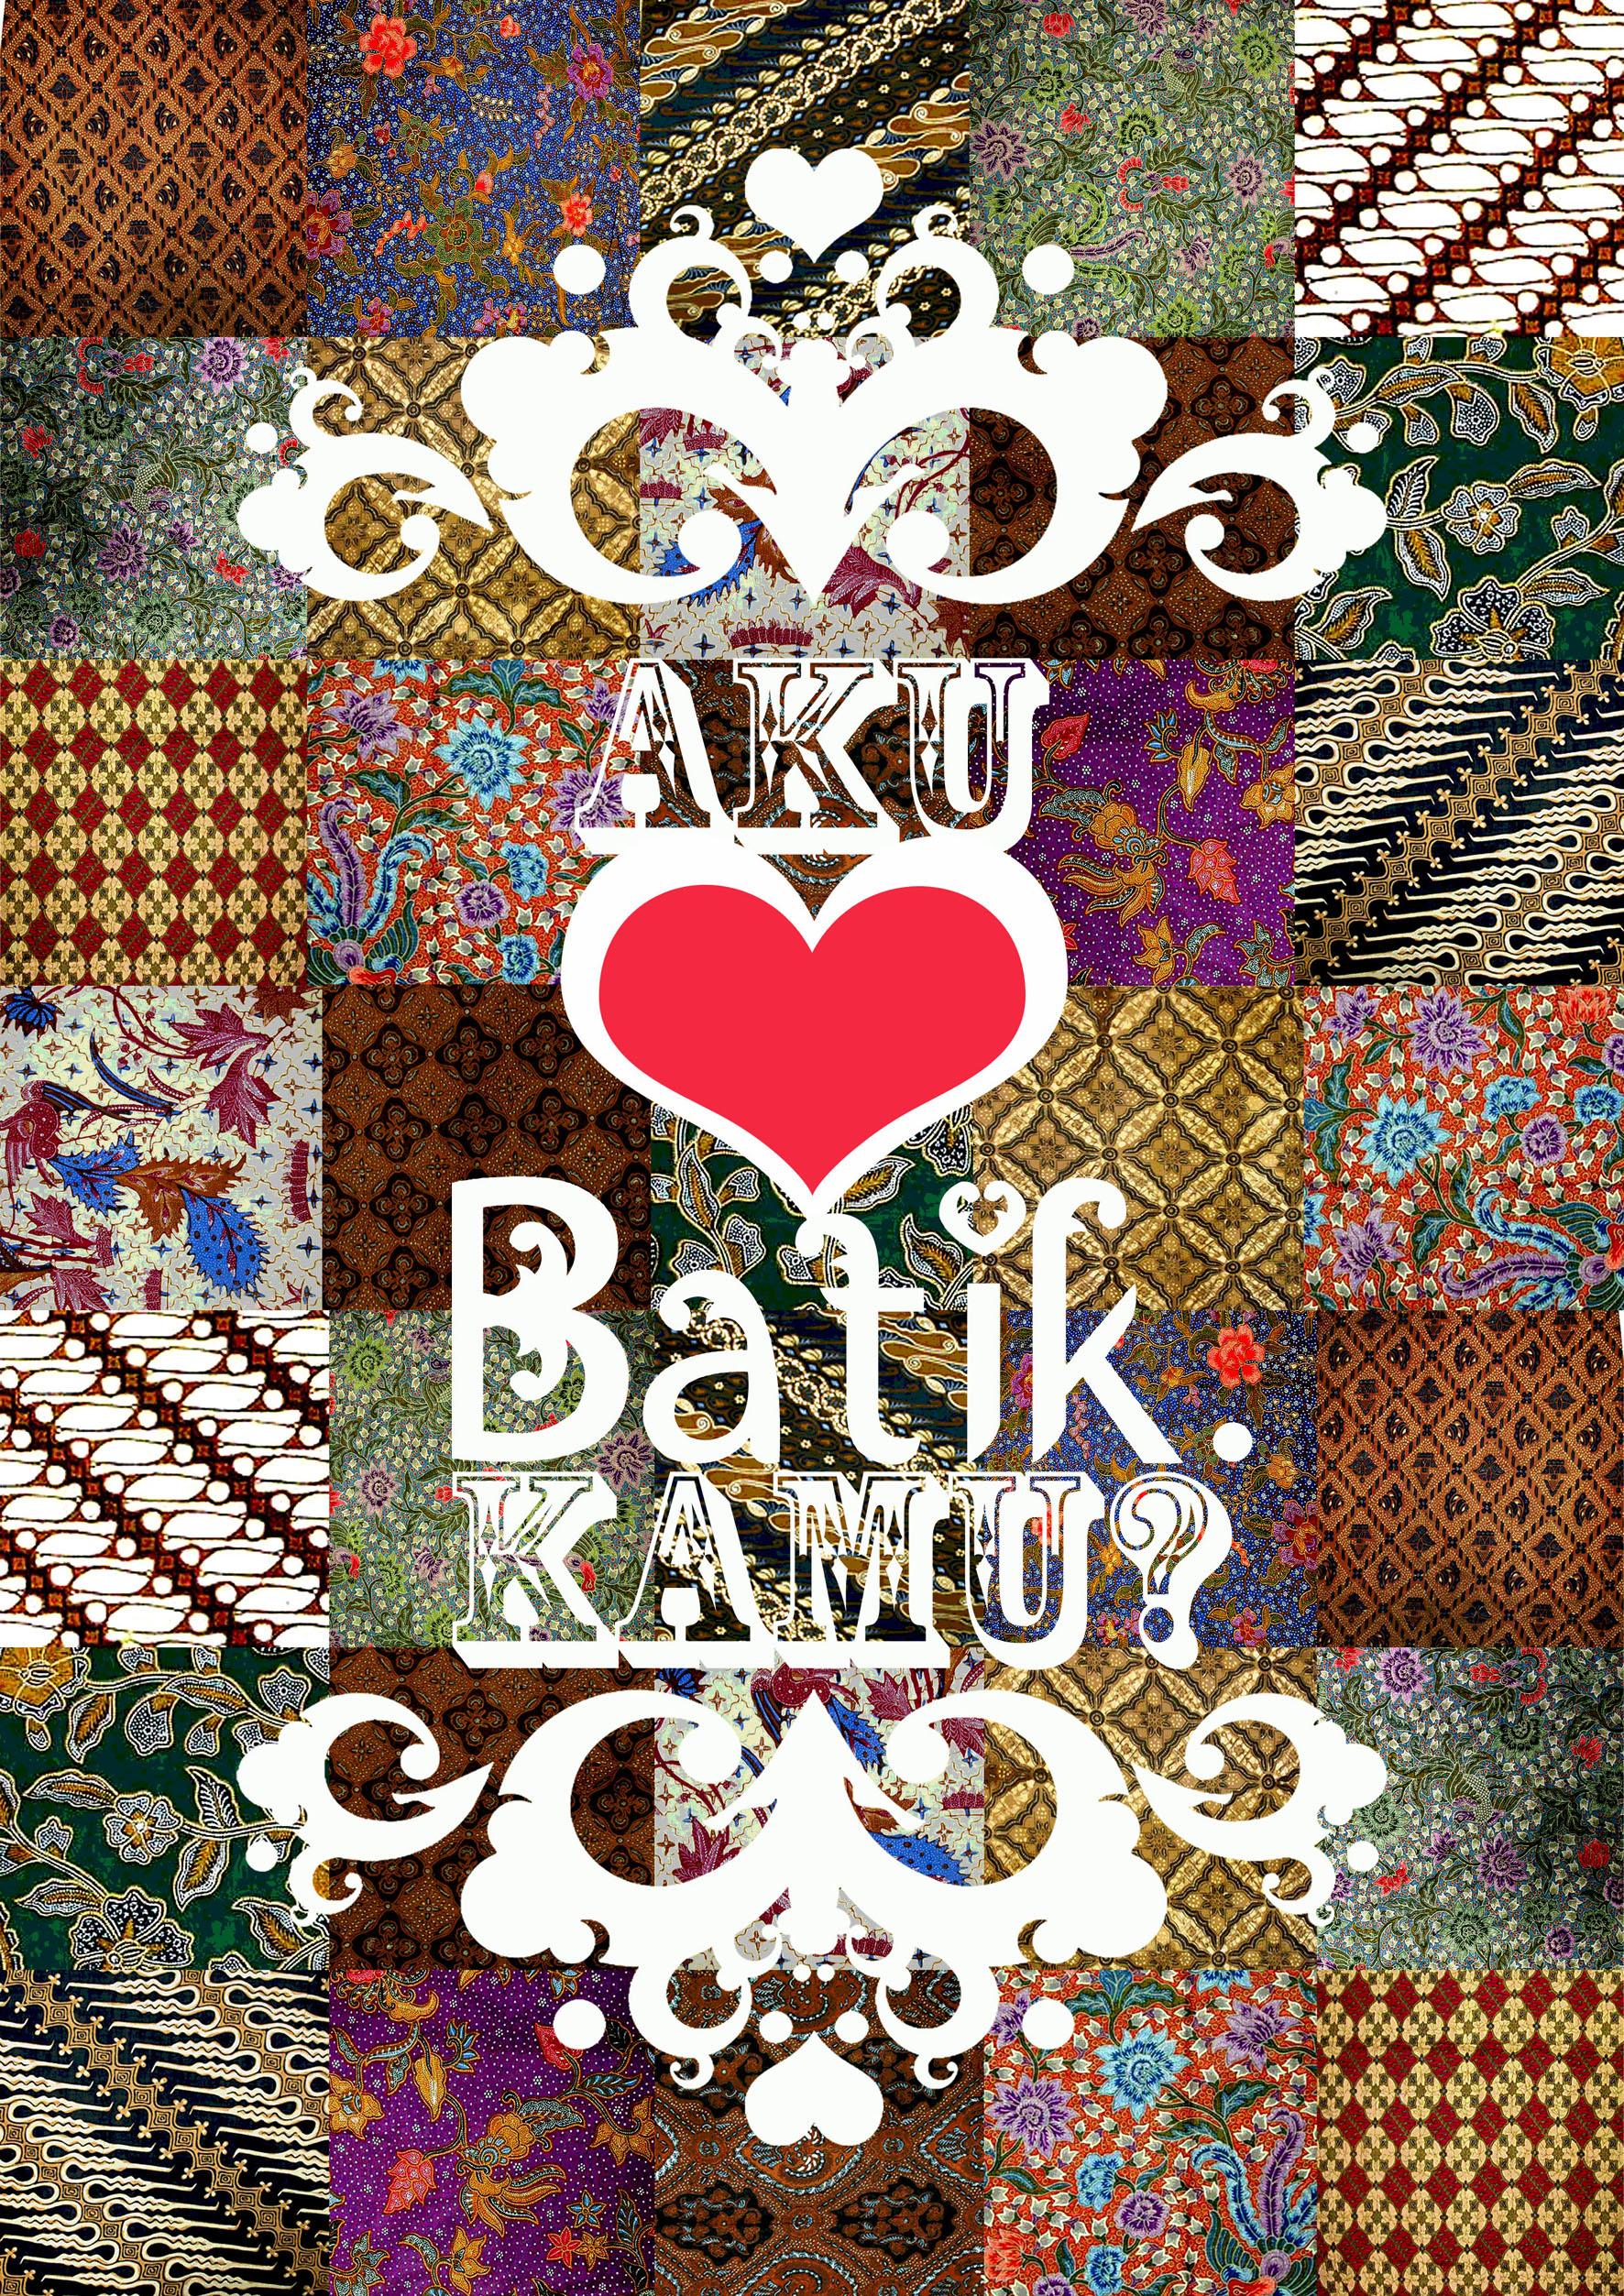 Cinta Batik?? | Nirmaladya's Blog